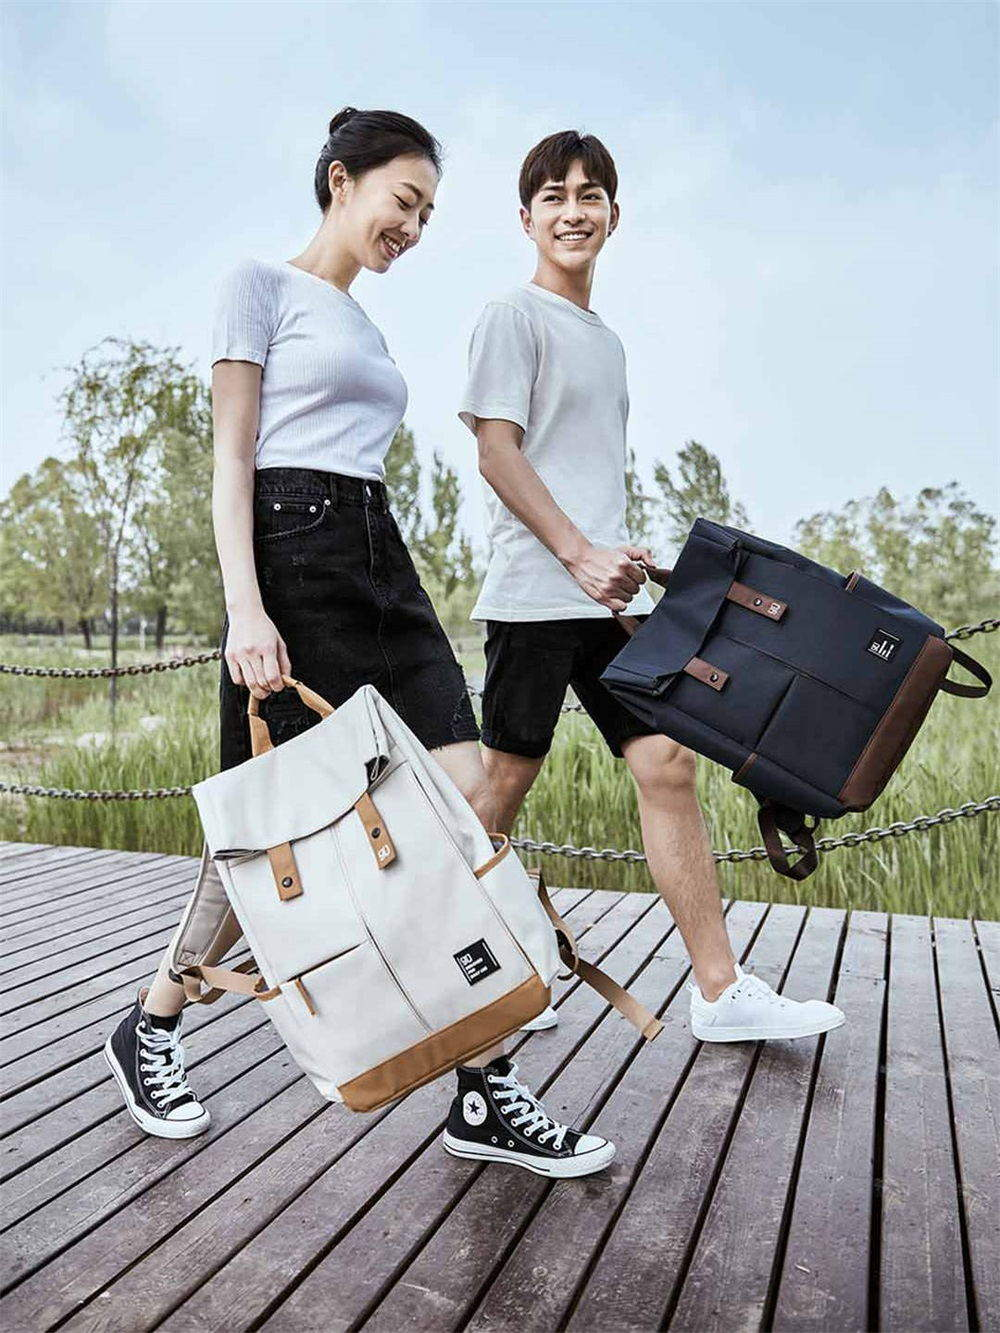 xiaomi 90fun leisure college bag for sale